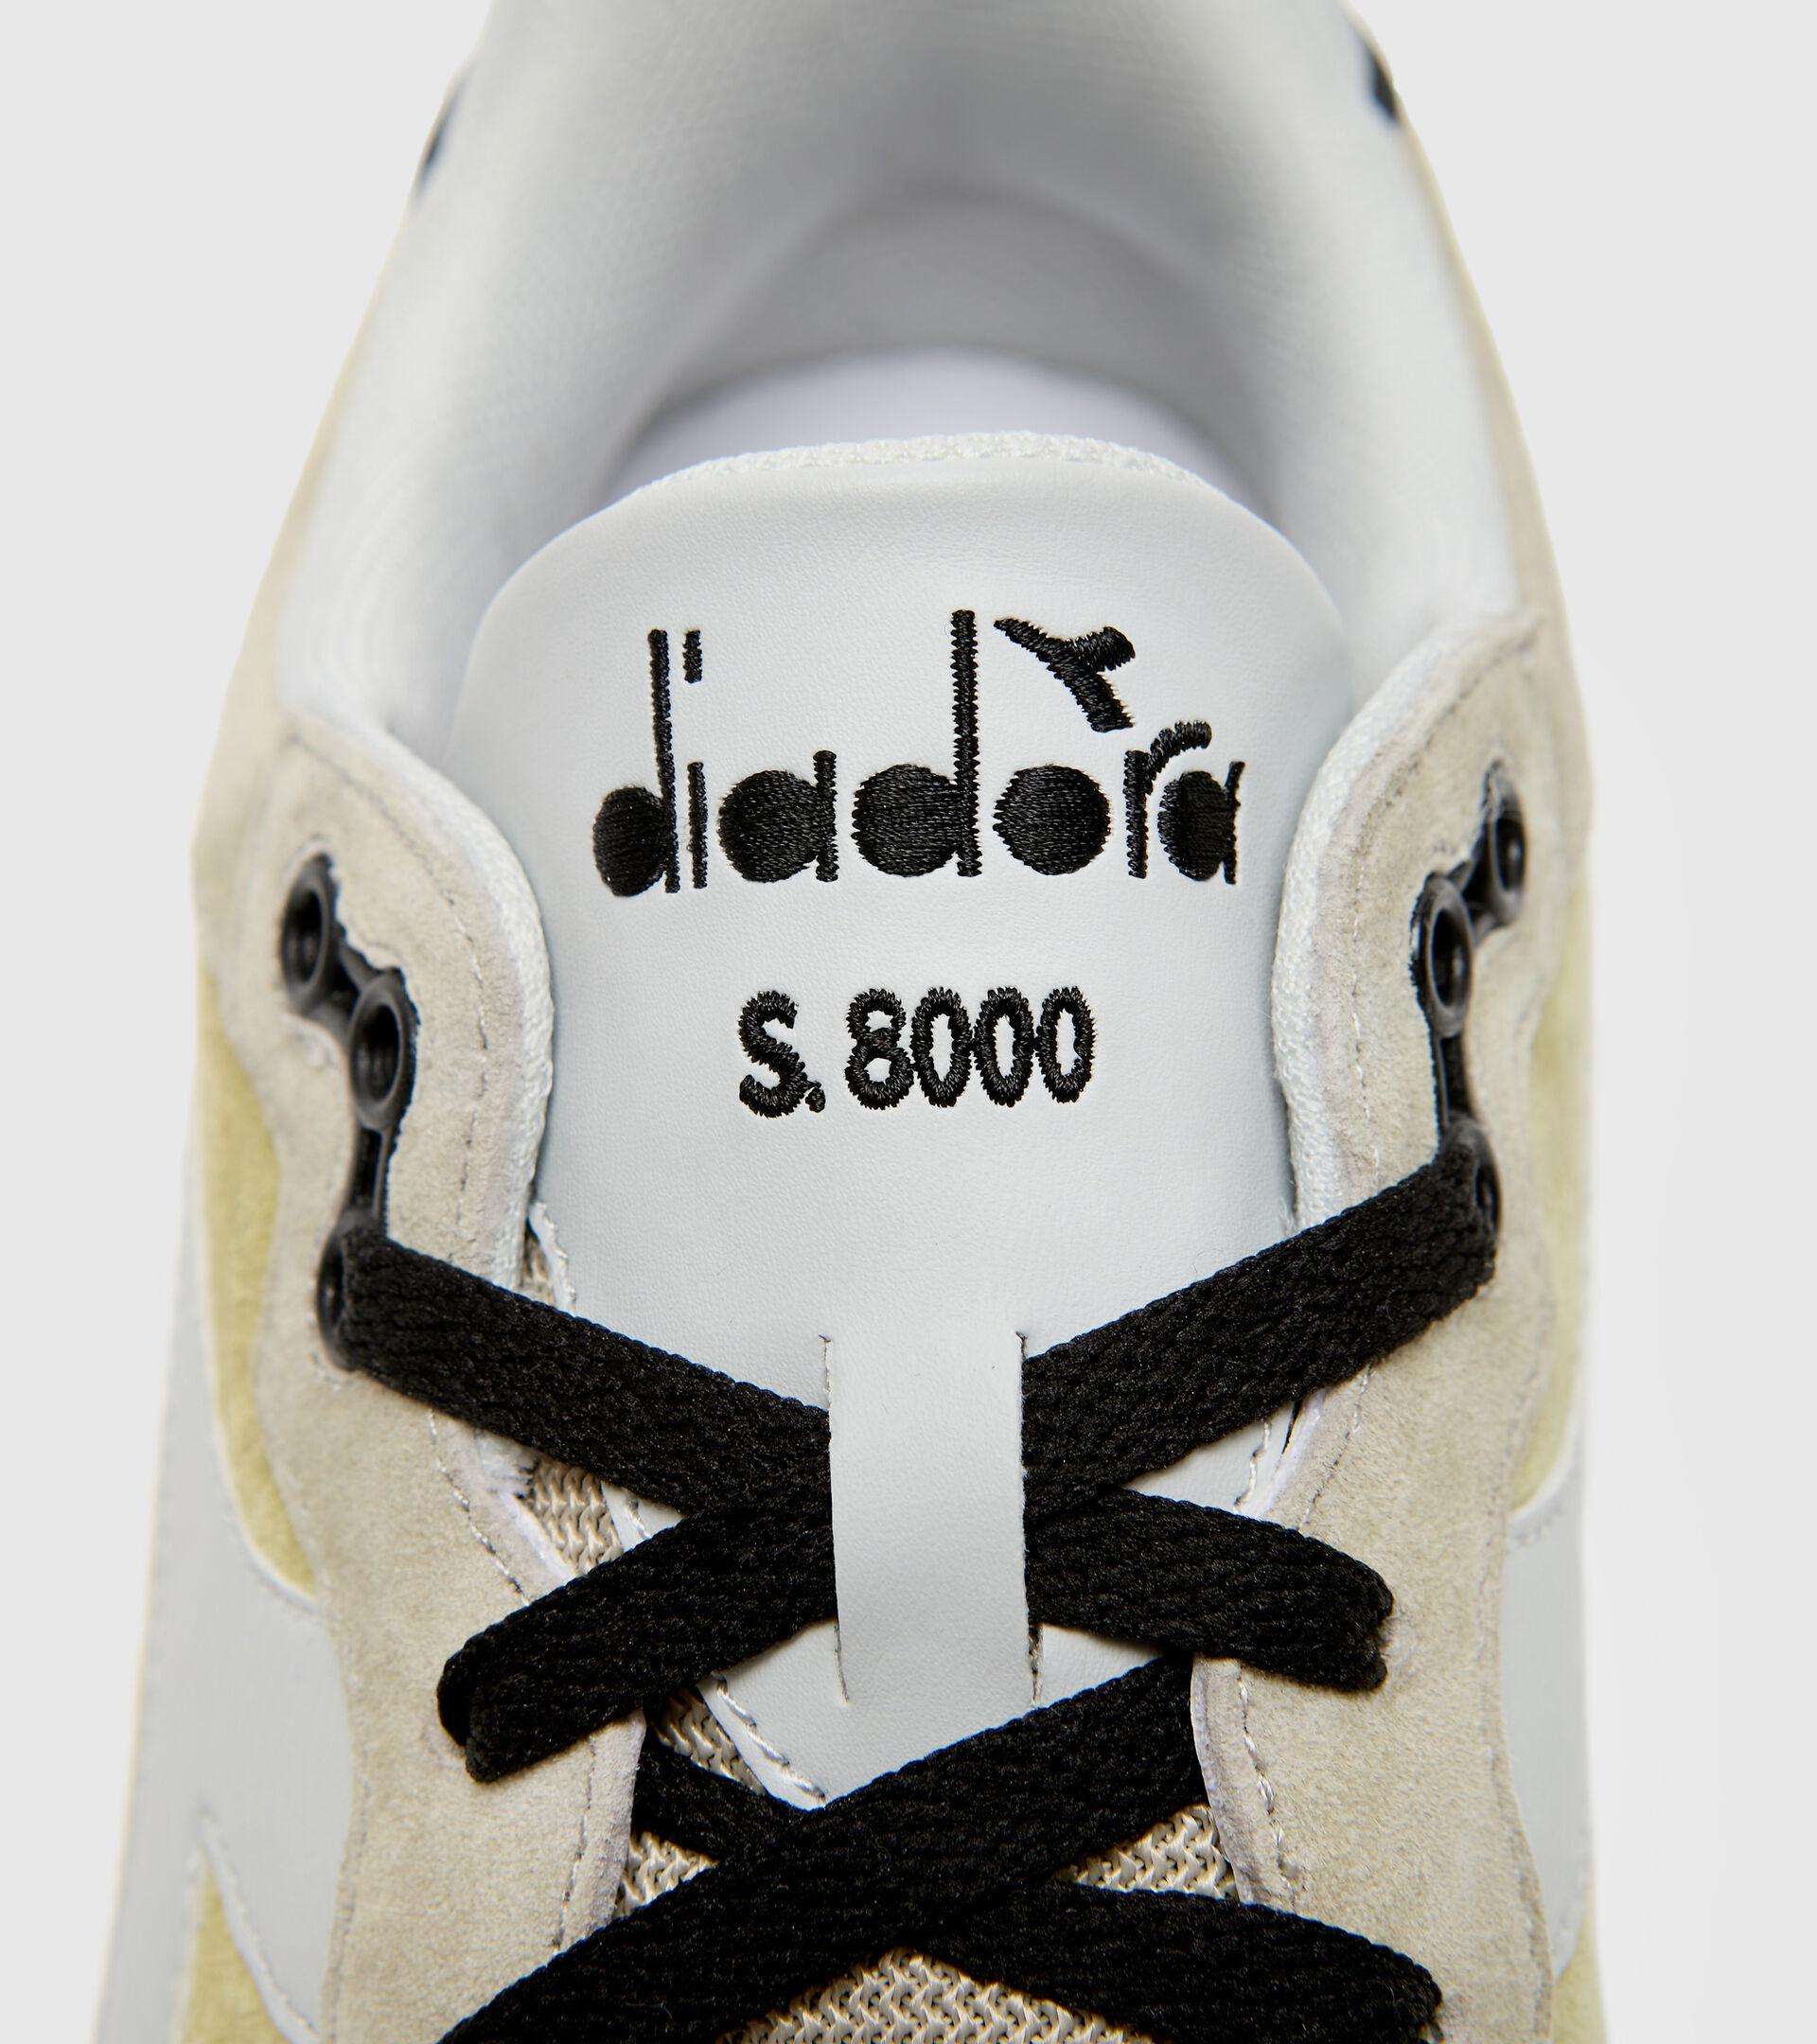 Sportschuh - Herren  S8000 OVERLAND GISCHT GRUEN - Diadora